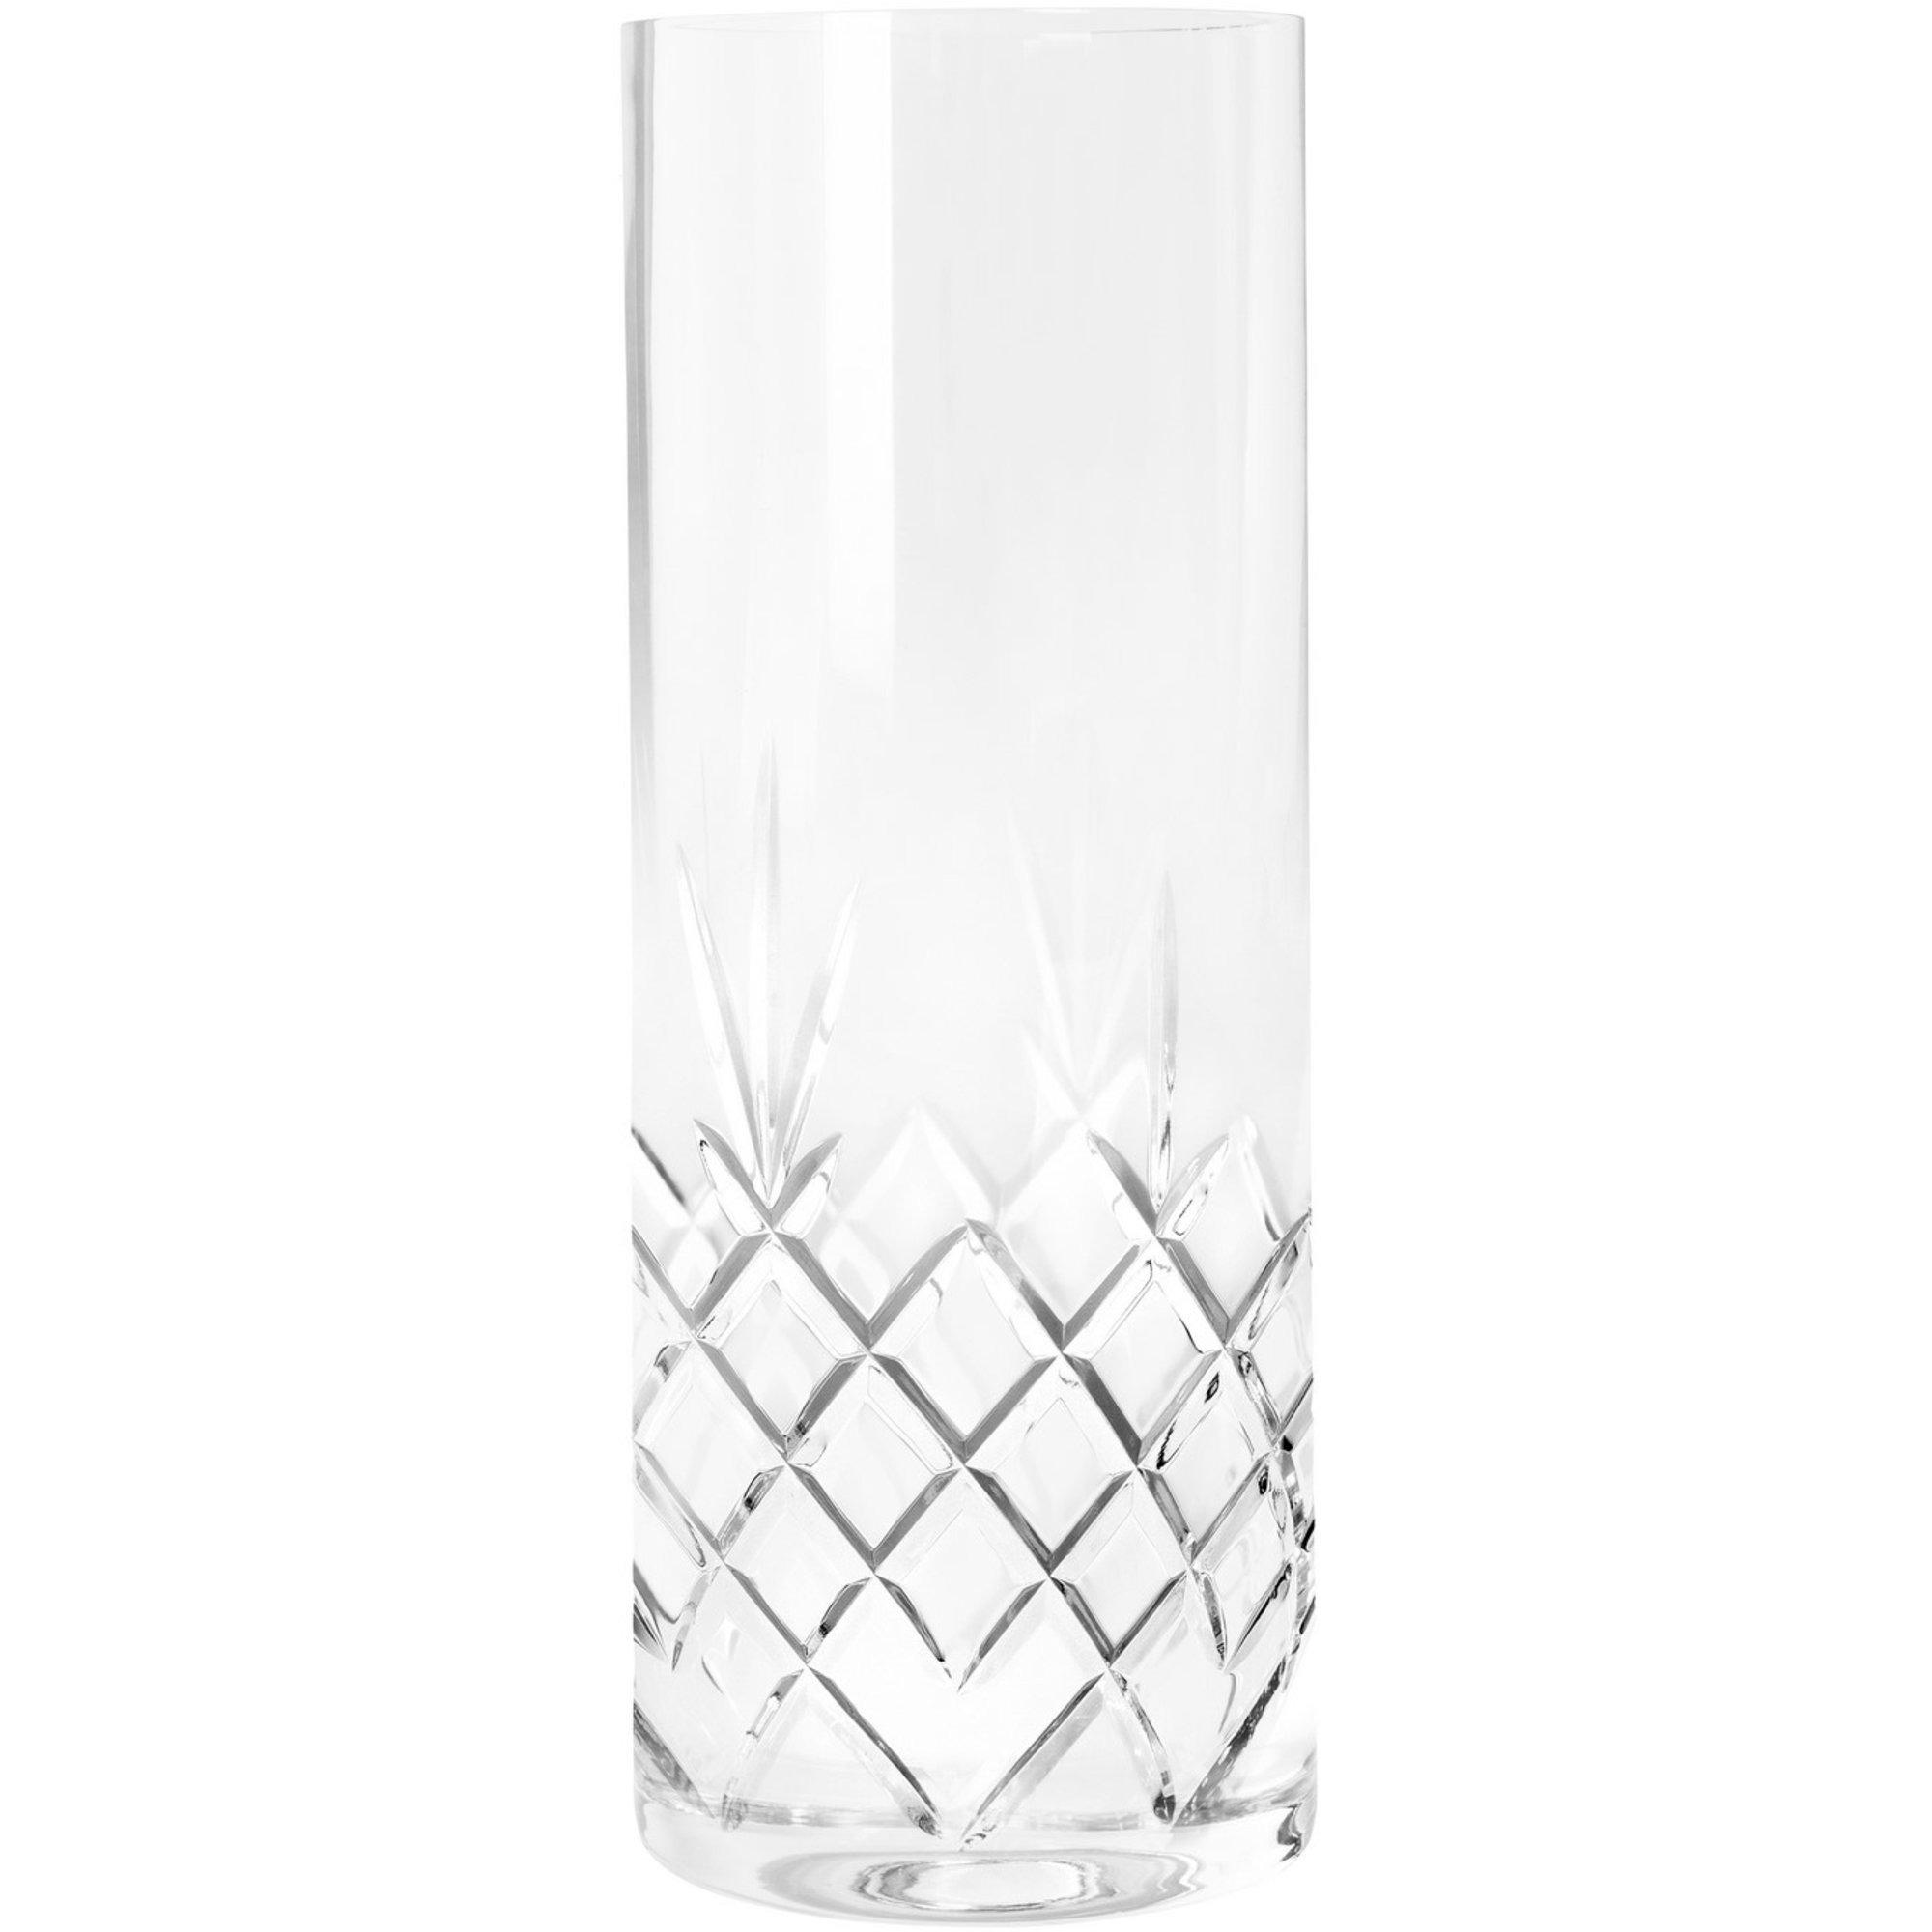 Frederik Bagger Crispy Love 2 vas i kristallglas